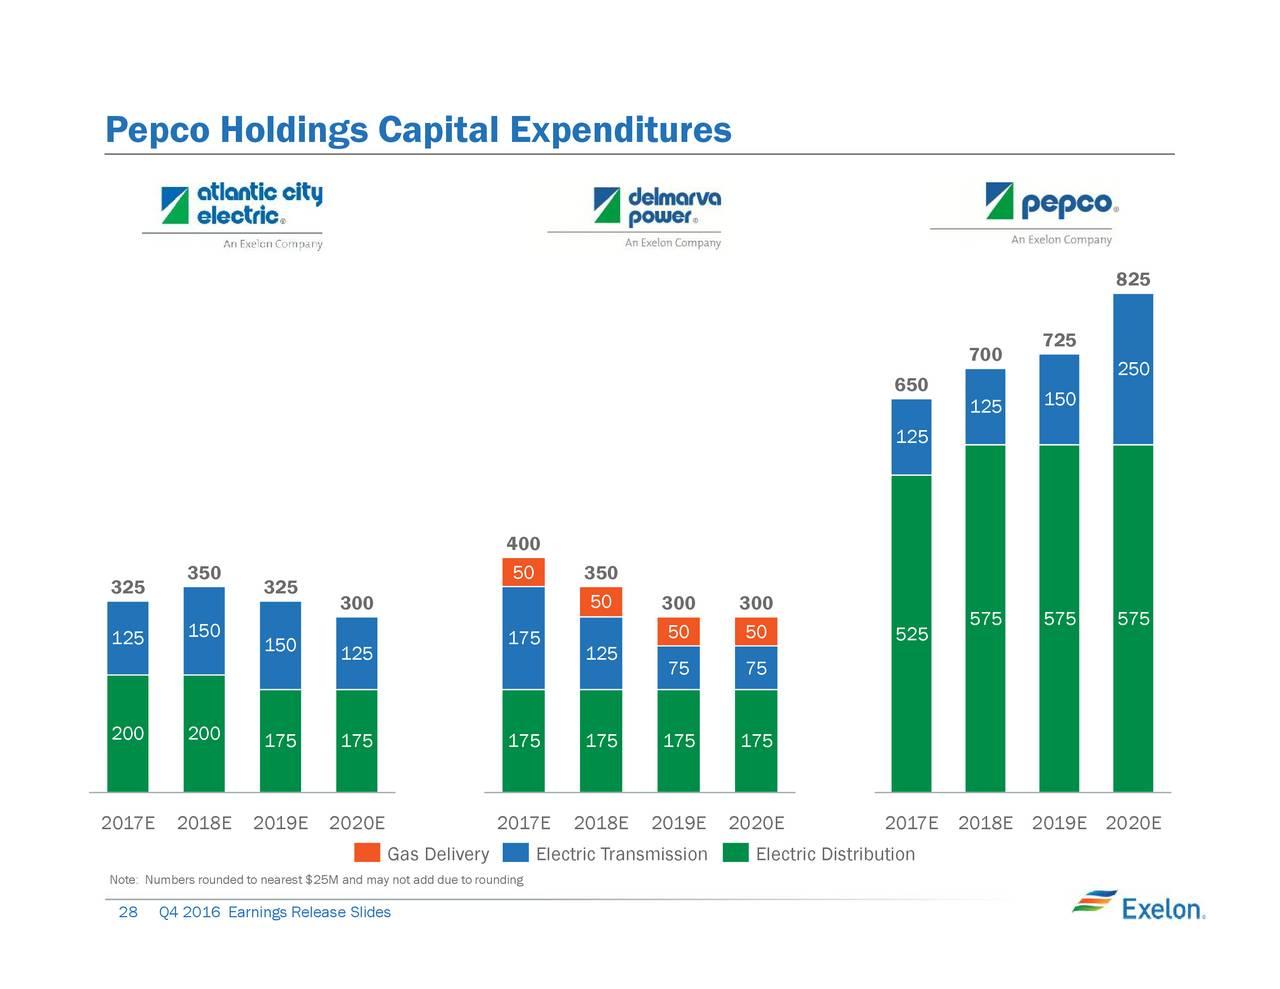 Exelon earnings call